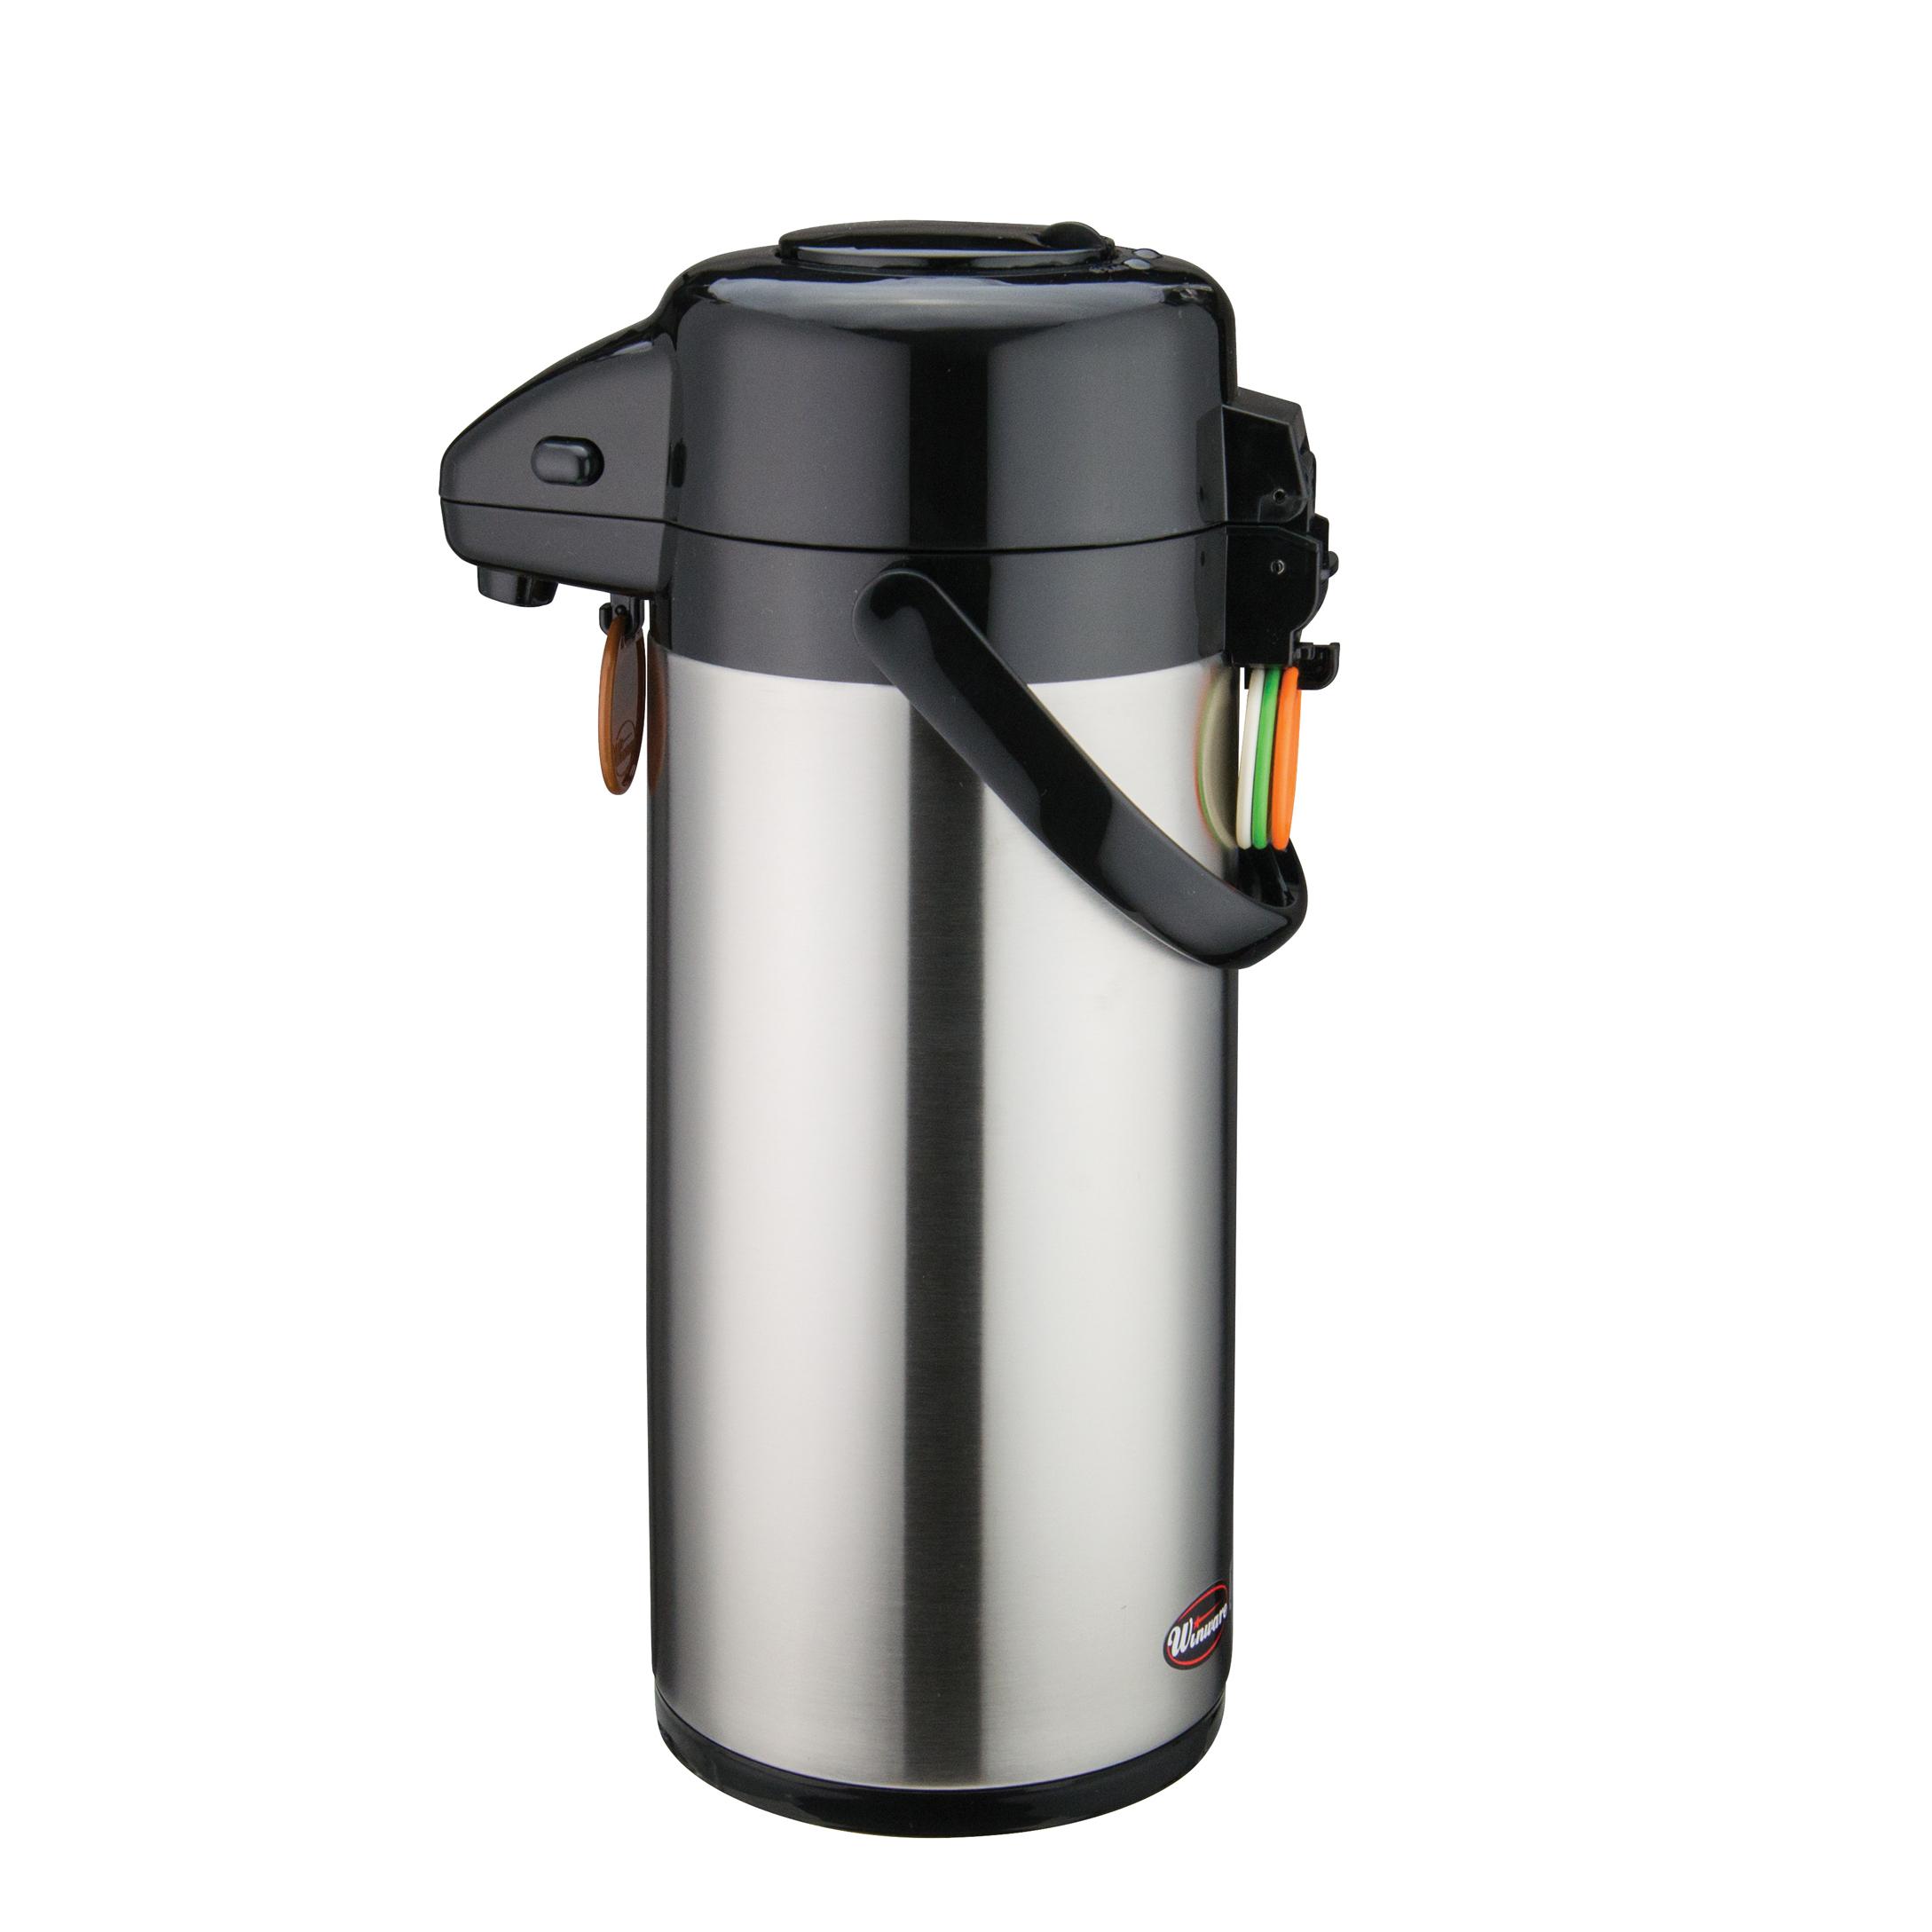 Winco APSP-925 airpot